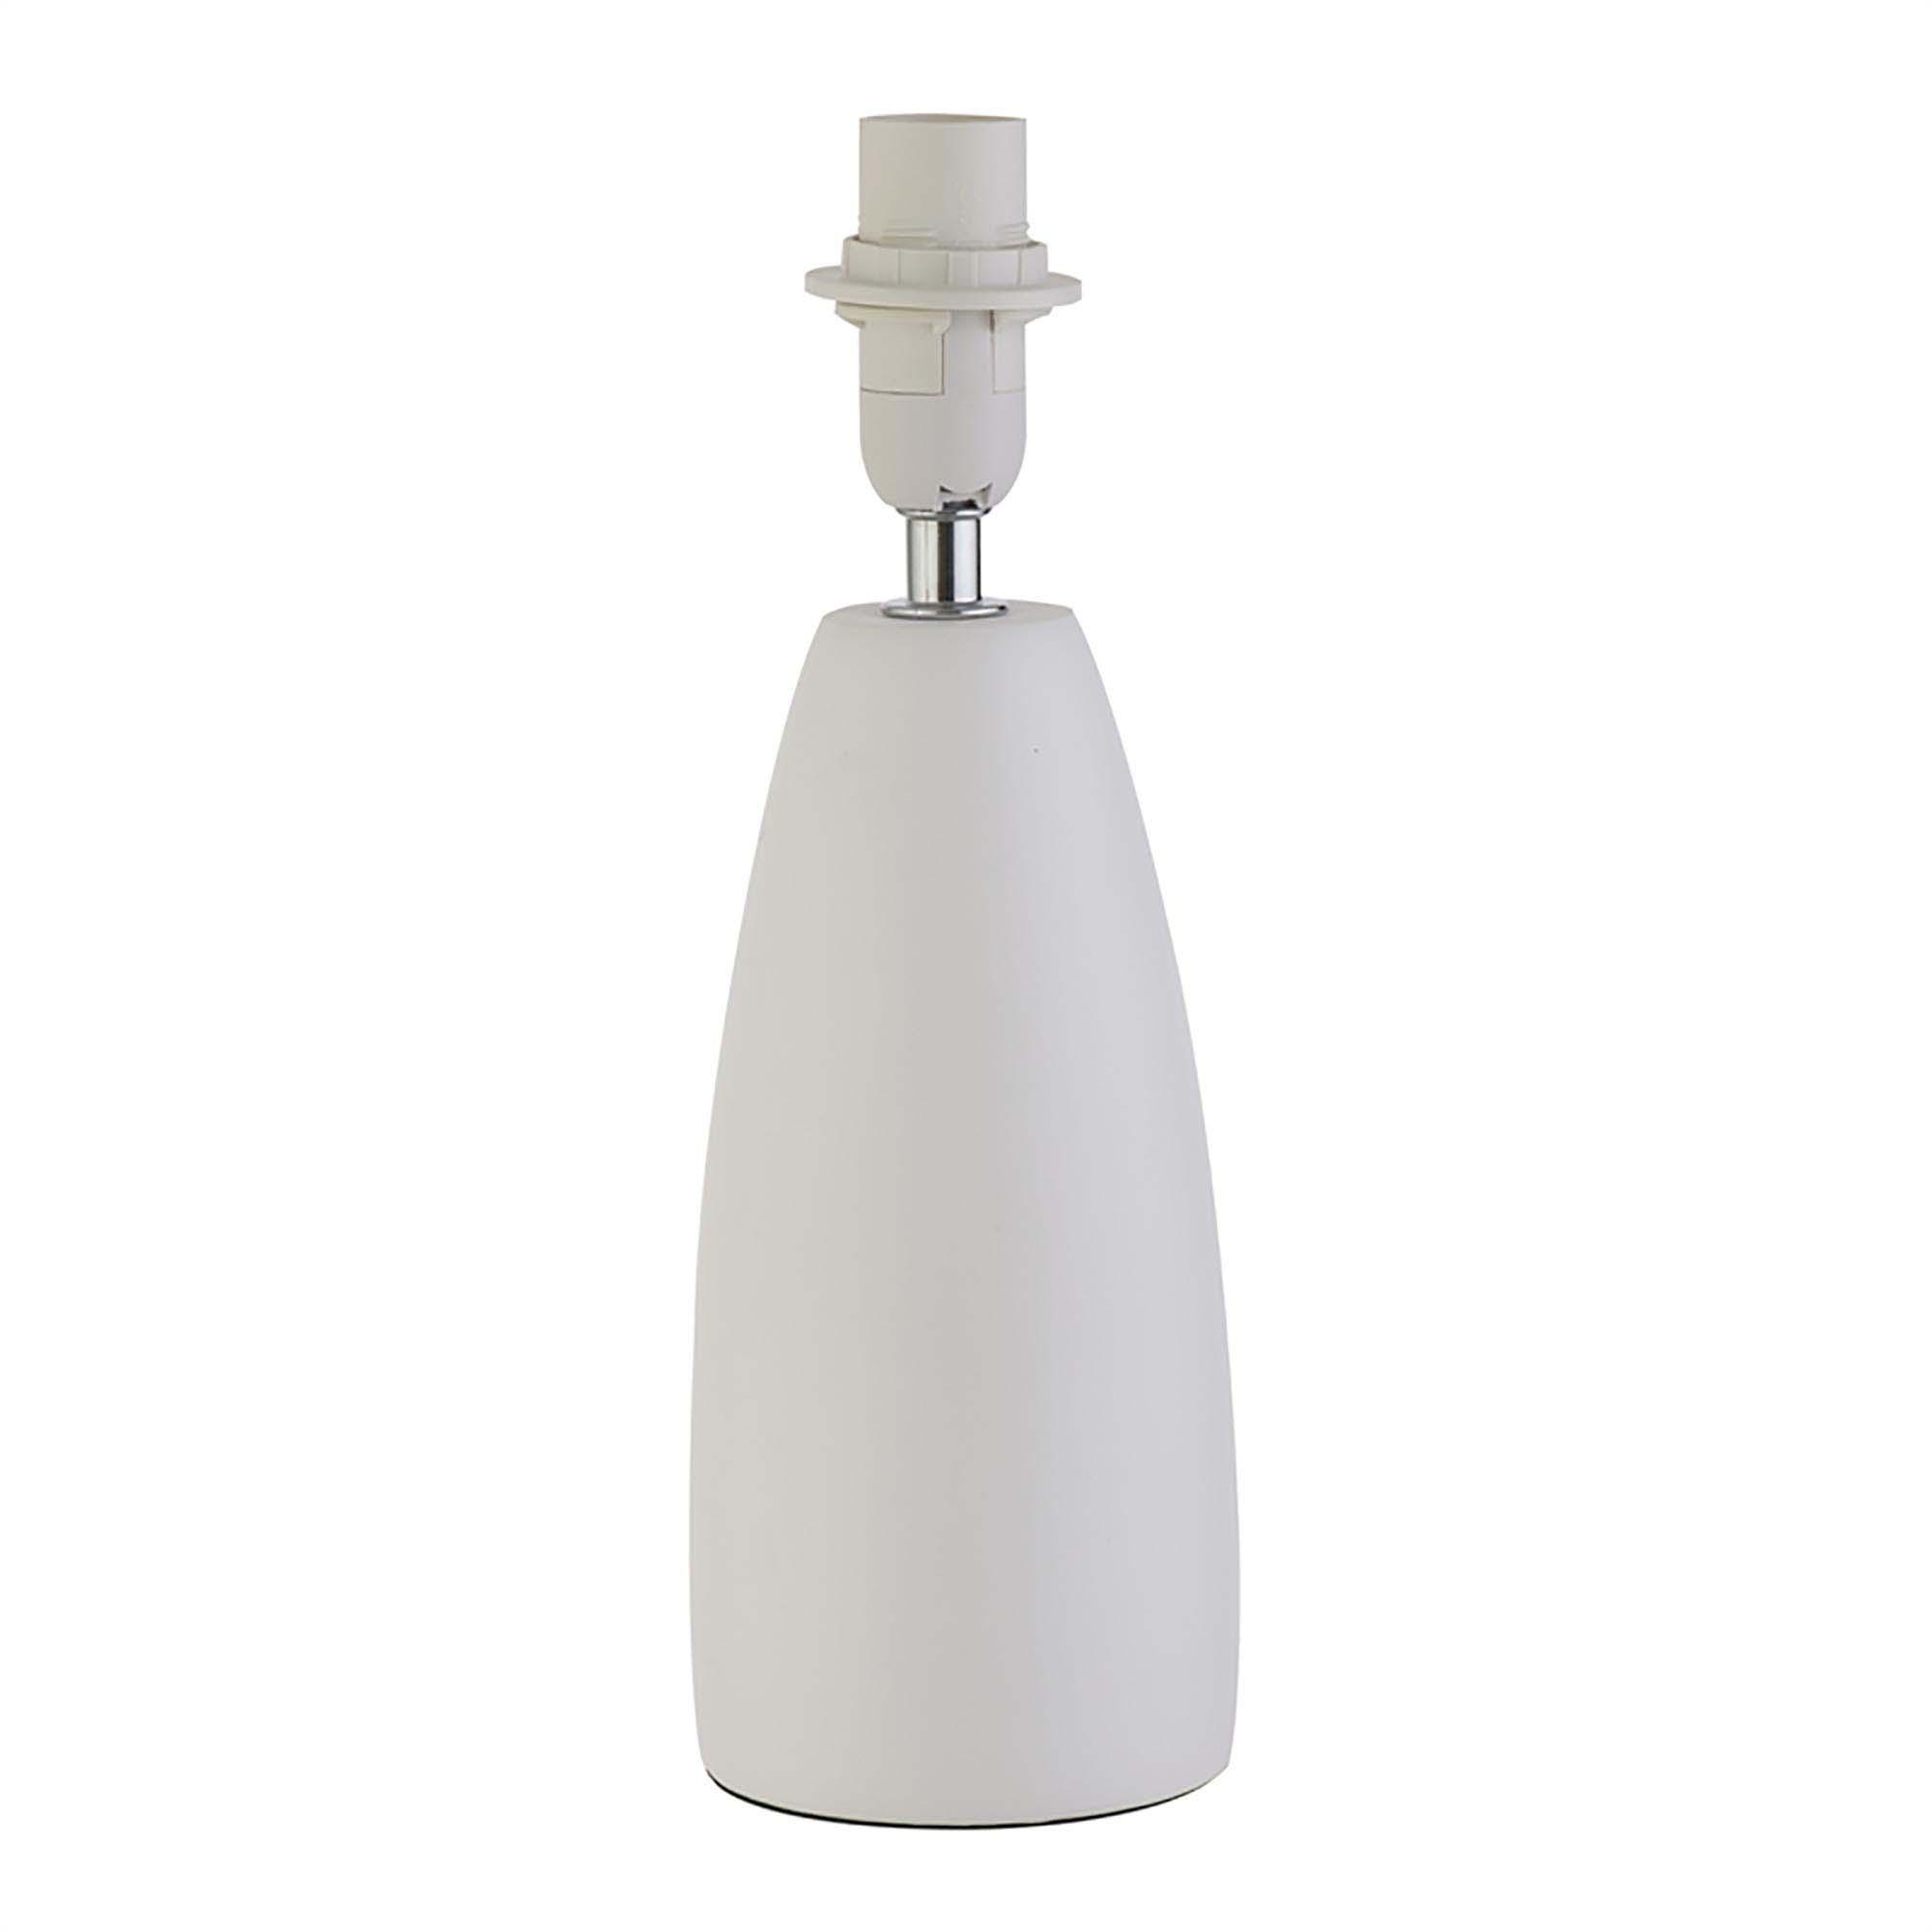 Verve design 28.5cm ceramic bonn lamp base